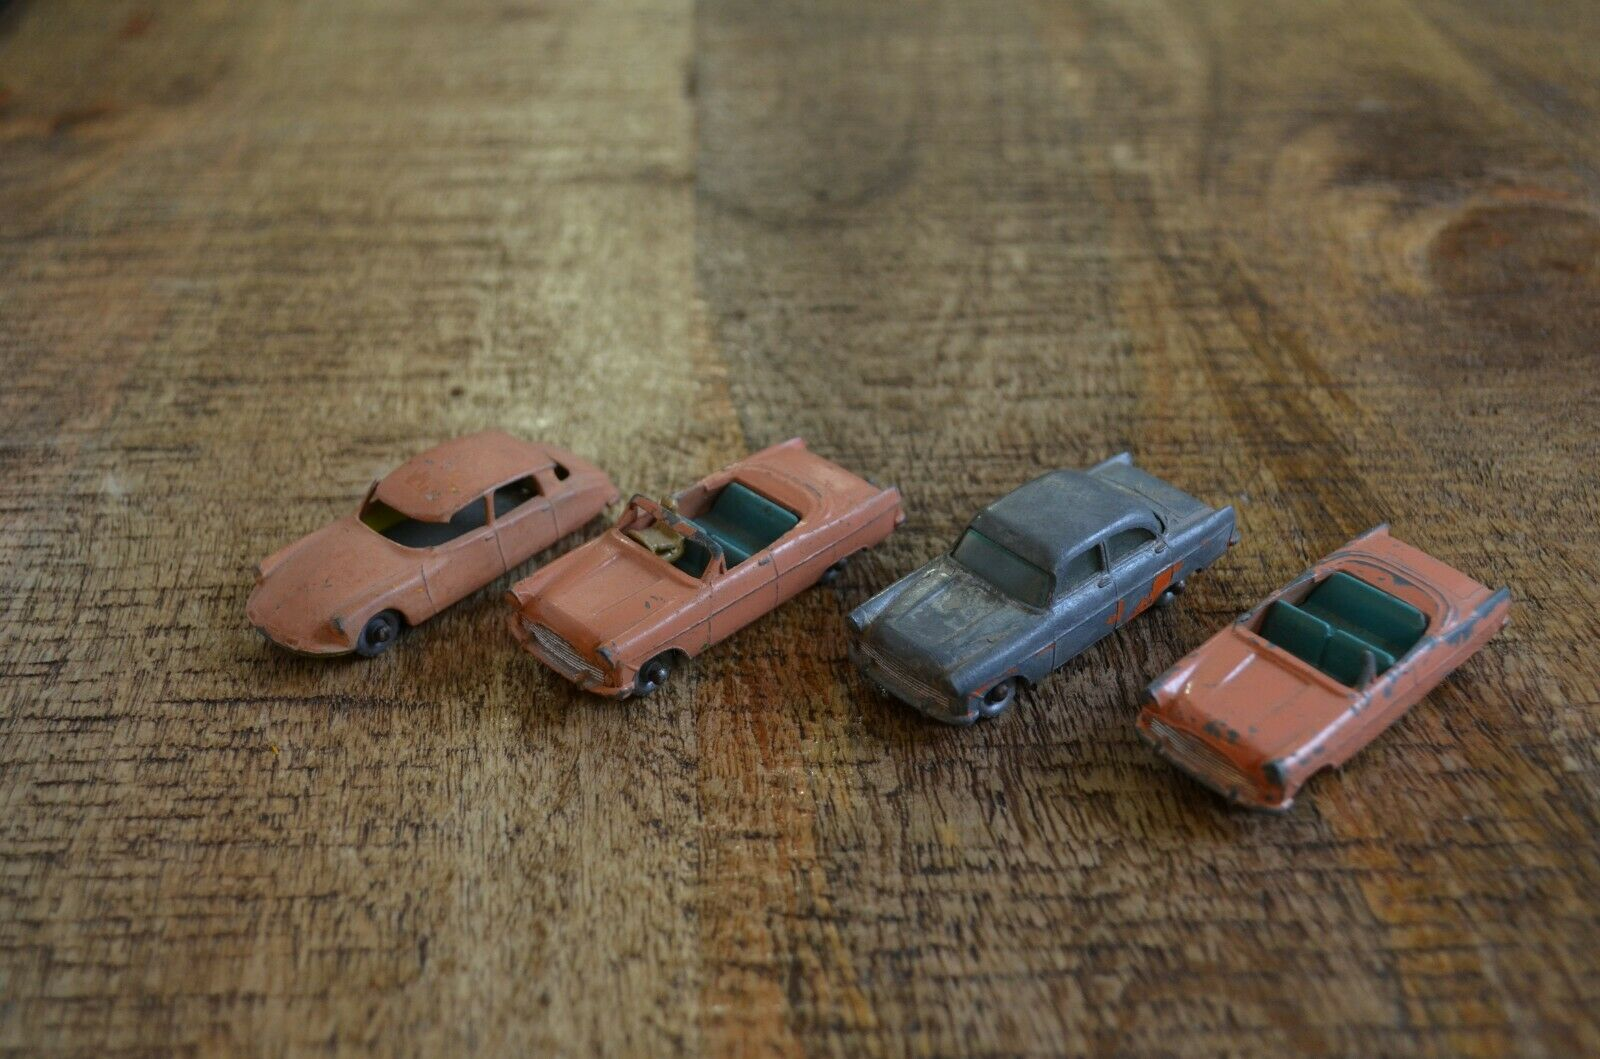 Lesney Ford Zodiac ConGrünible + Citroen Peach grau Wheels Lot of 4 England